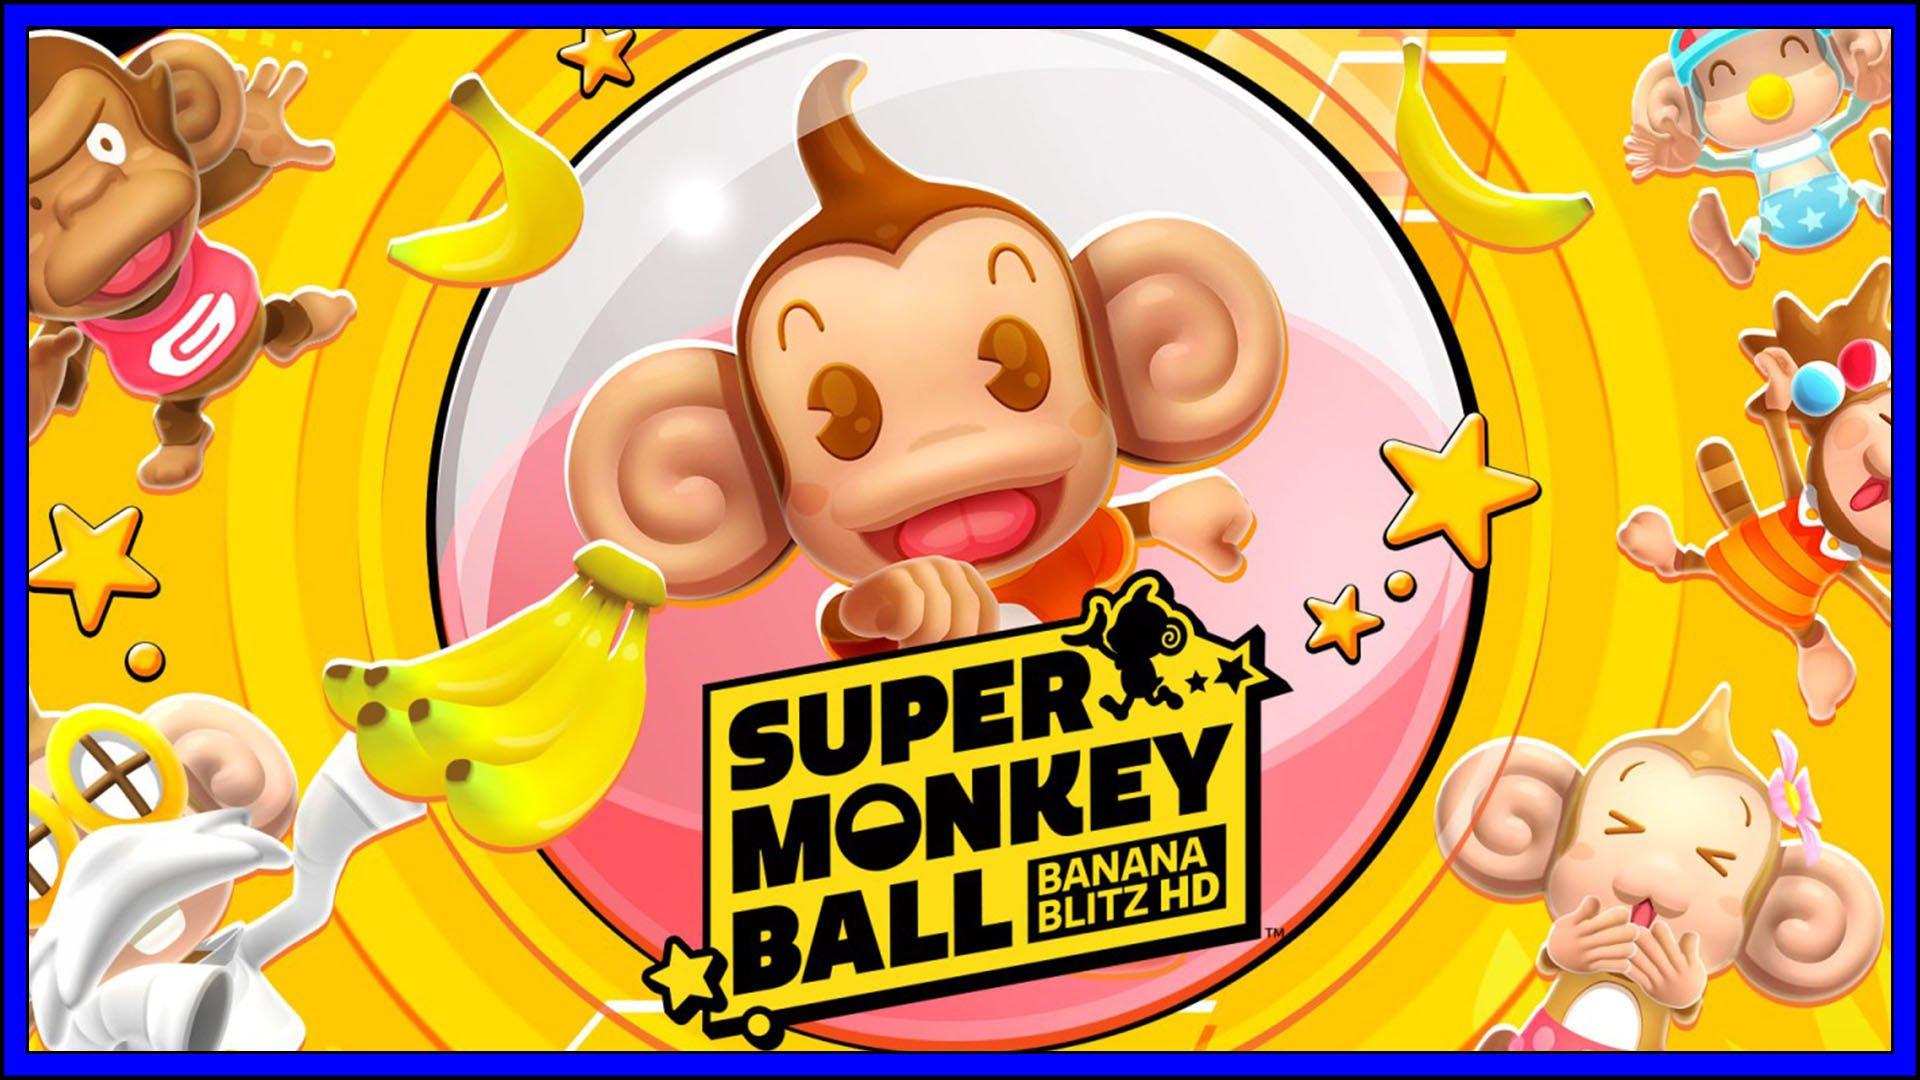 Super Monkey Ball: Banana Blitz HD (PS4) Review